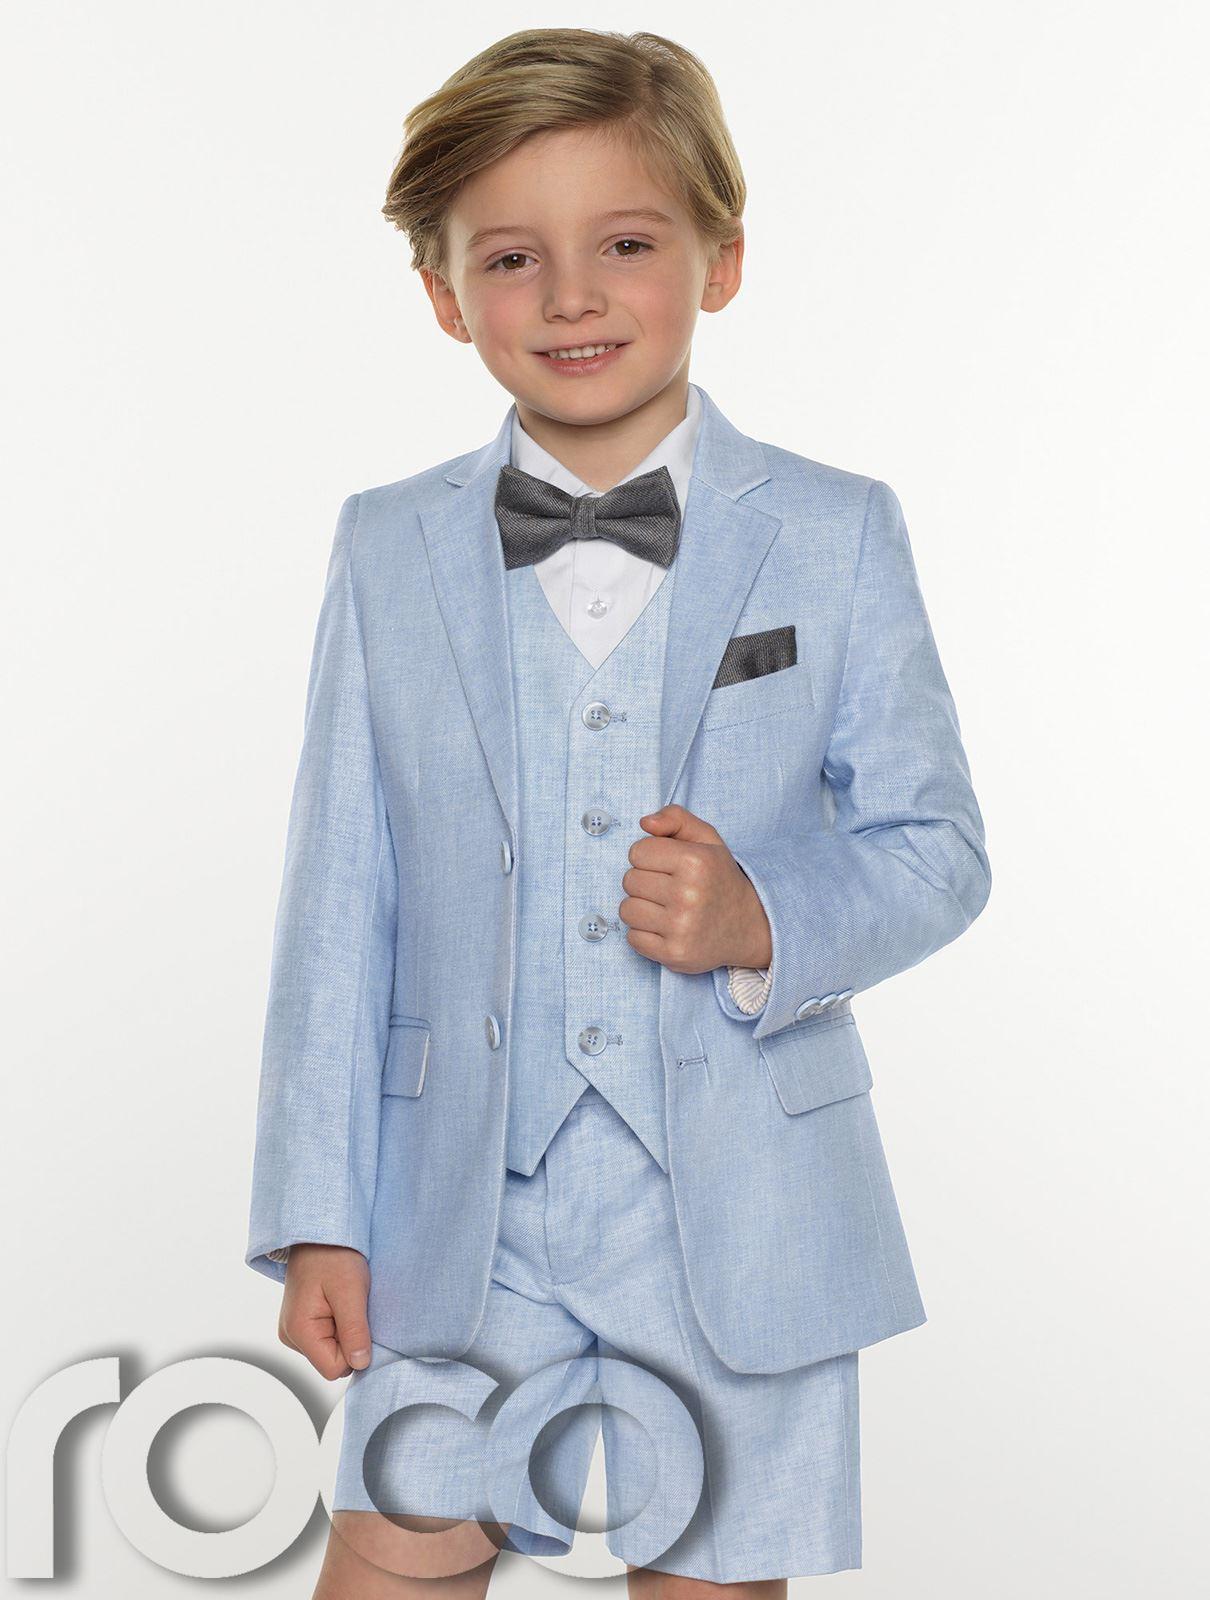 Boys Suits Boys Linen Suits Page Boy Outfits Boys